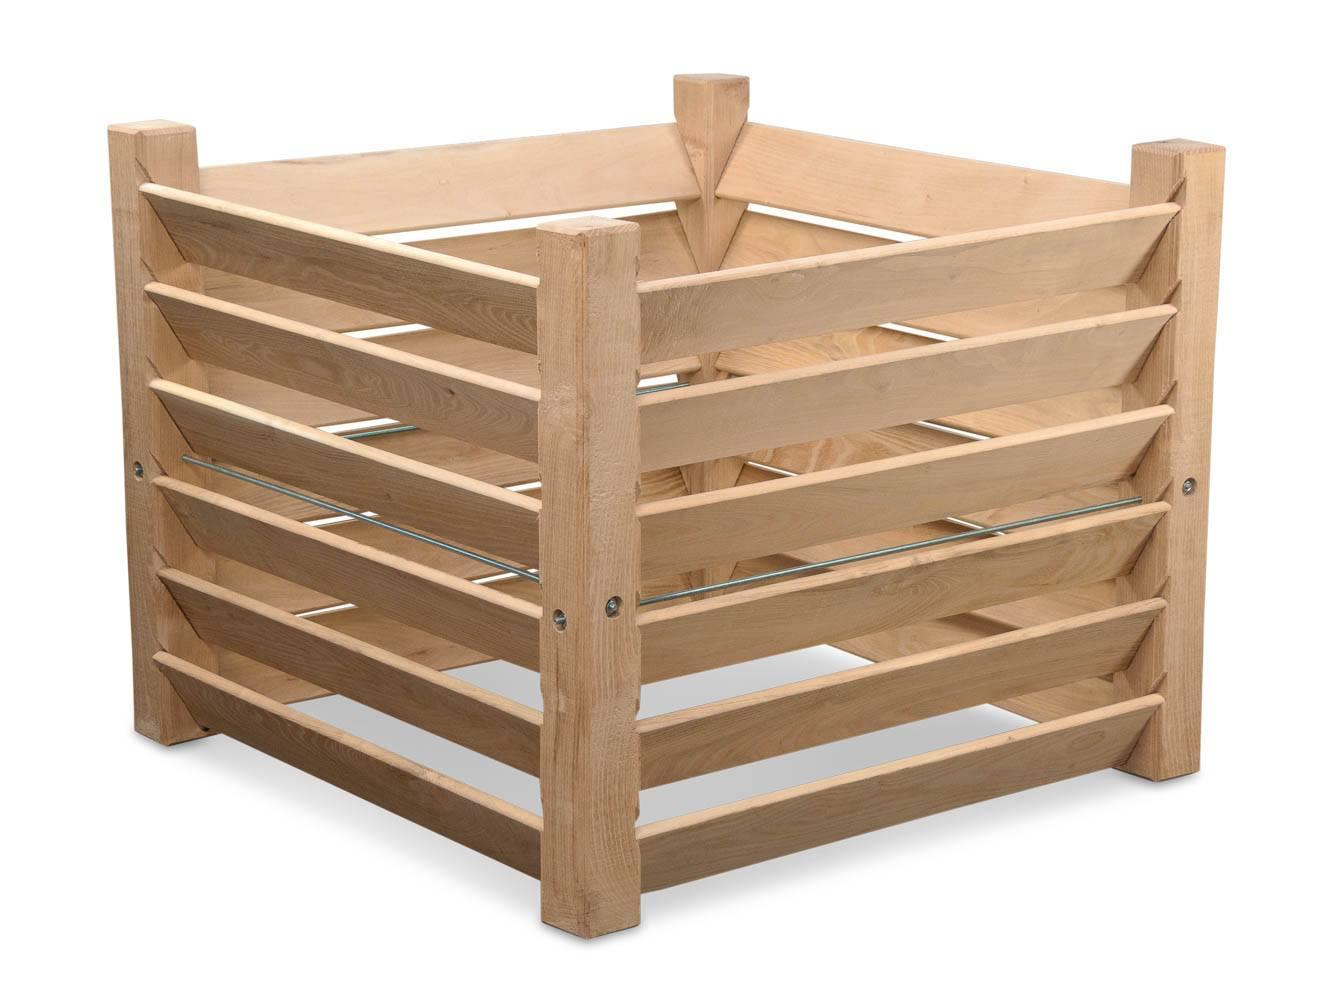 Timberrud Kompostbeholder